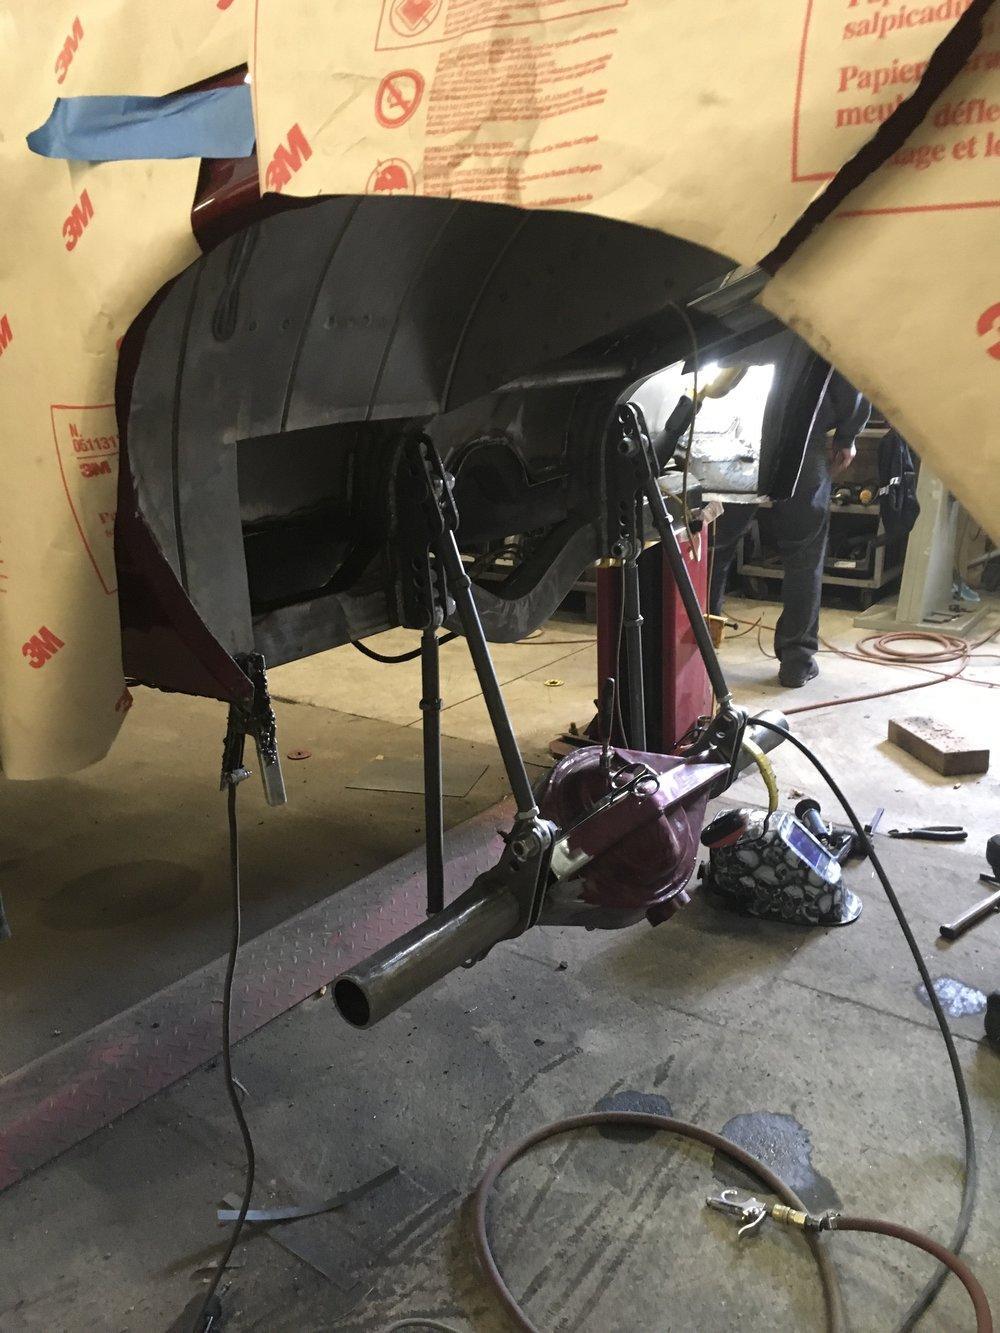 1985-monte-carlo-minnespota-car-restoration-hot-rod-factory.jpg